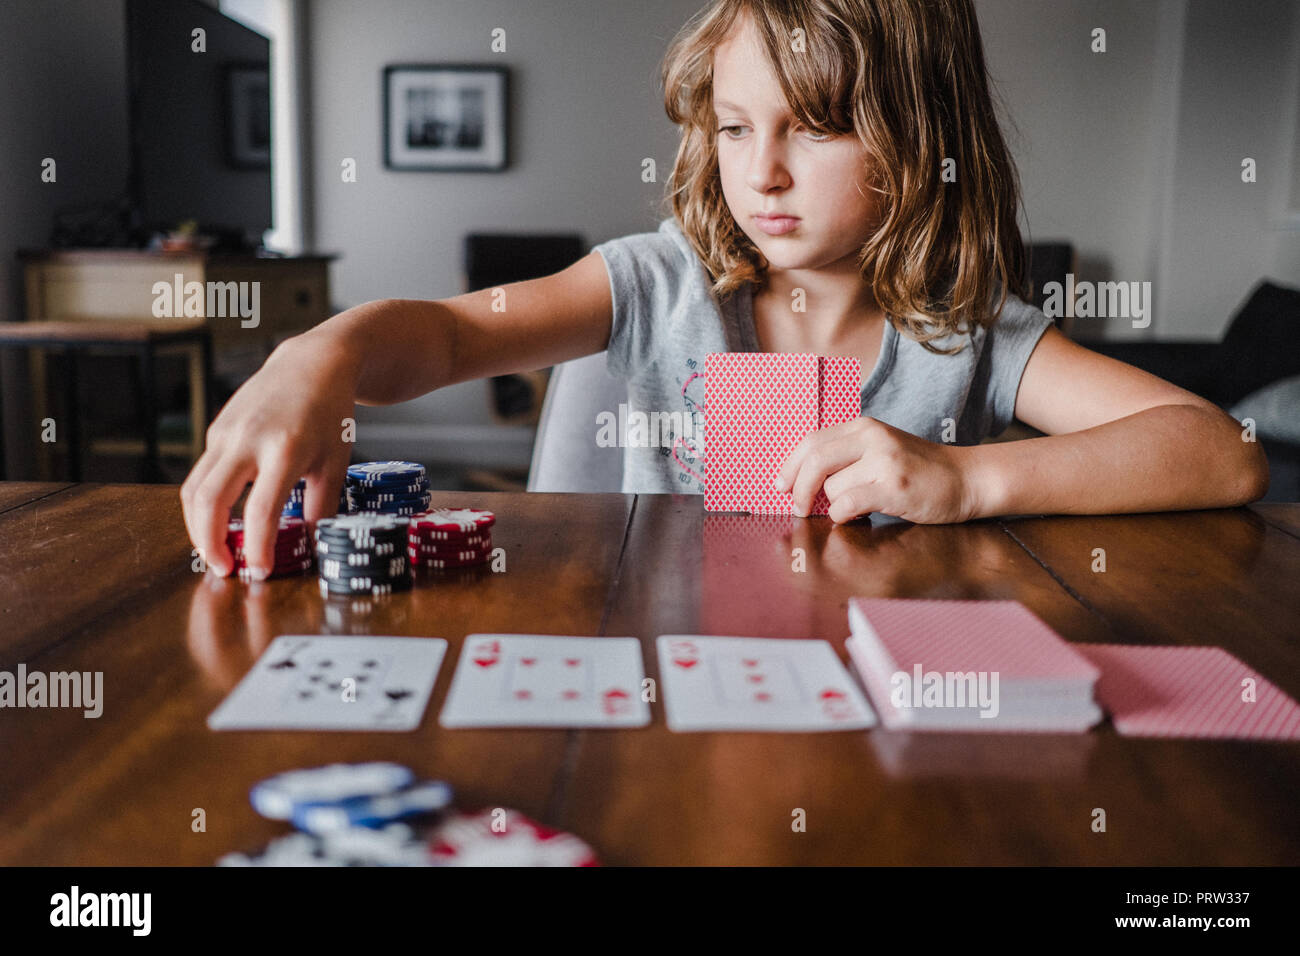 Mädchen spielen Karten am Tisch, Stapeln Spieljetons Stockbild